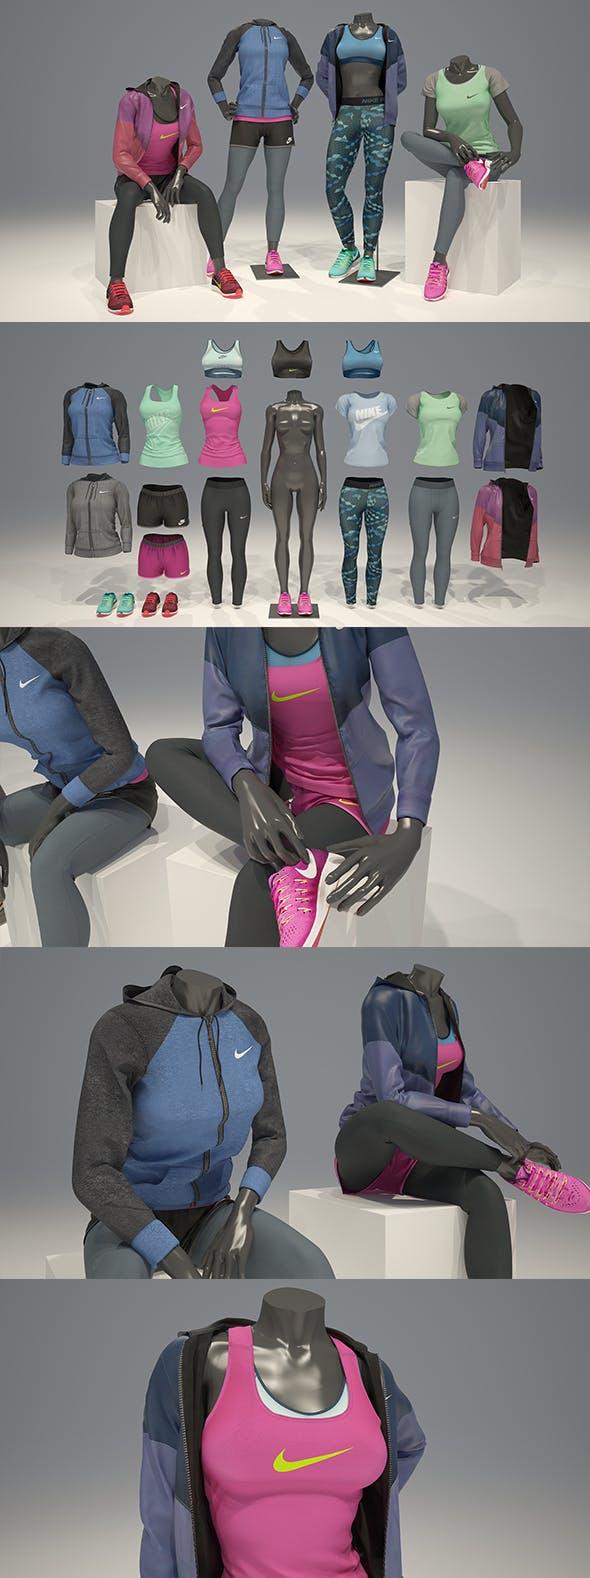 Female mannequin Nike pack 3 3D model - 3DOcean Item for Sale